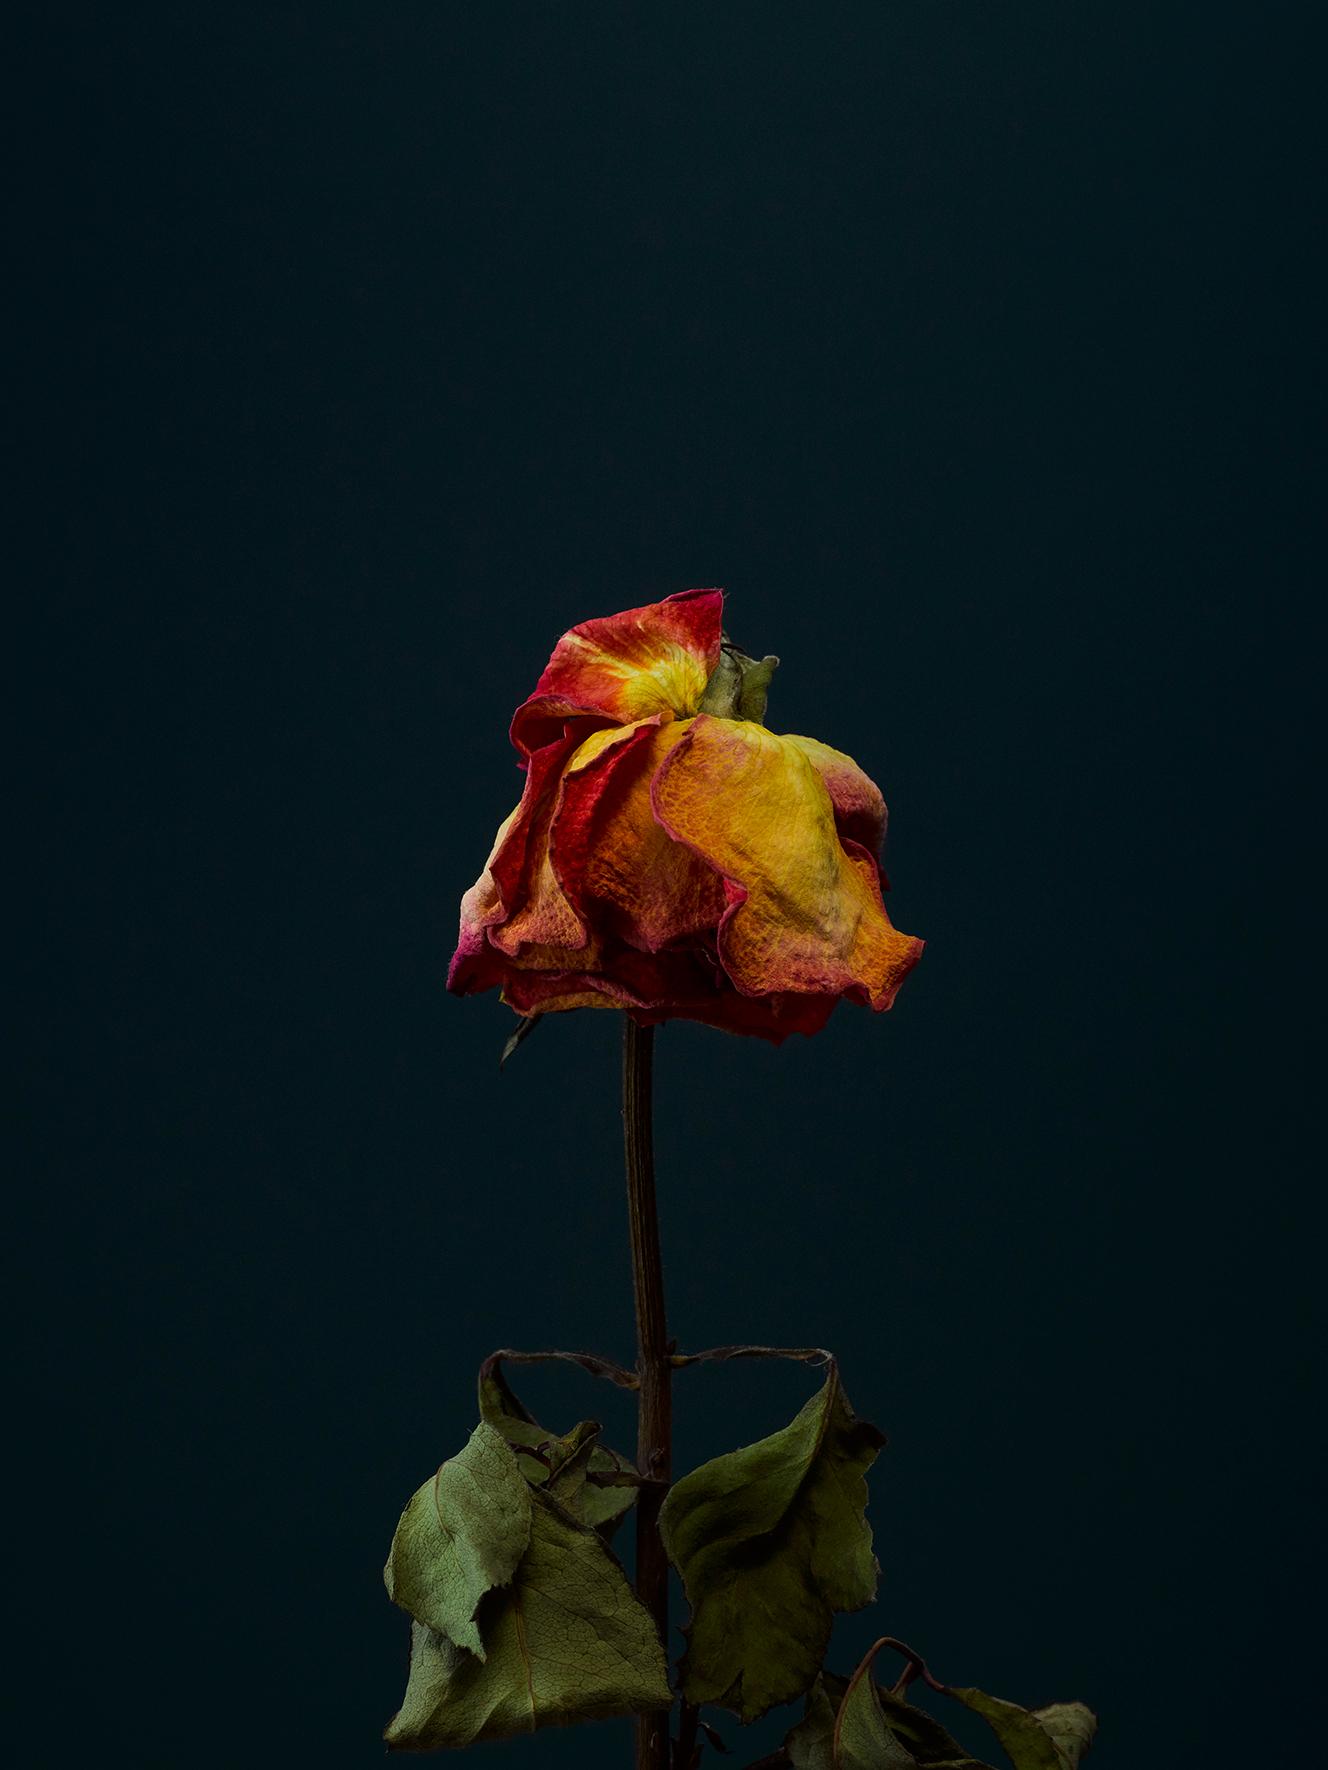 rose-2-copy.jpg